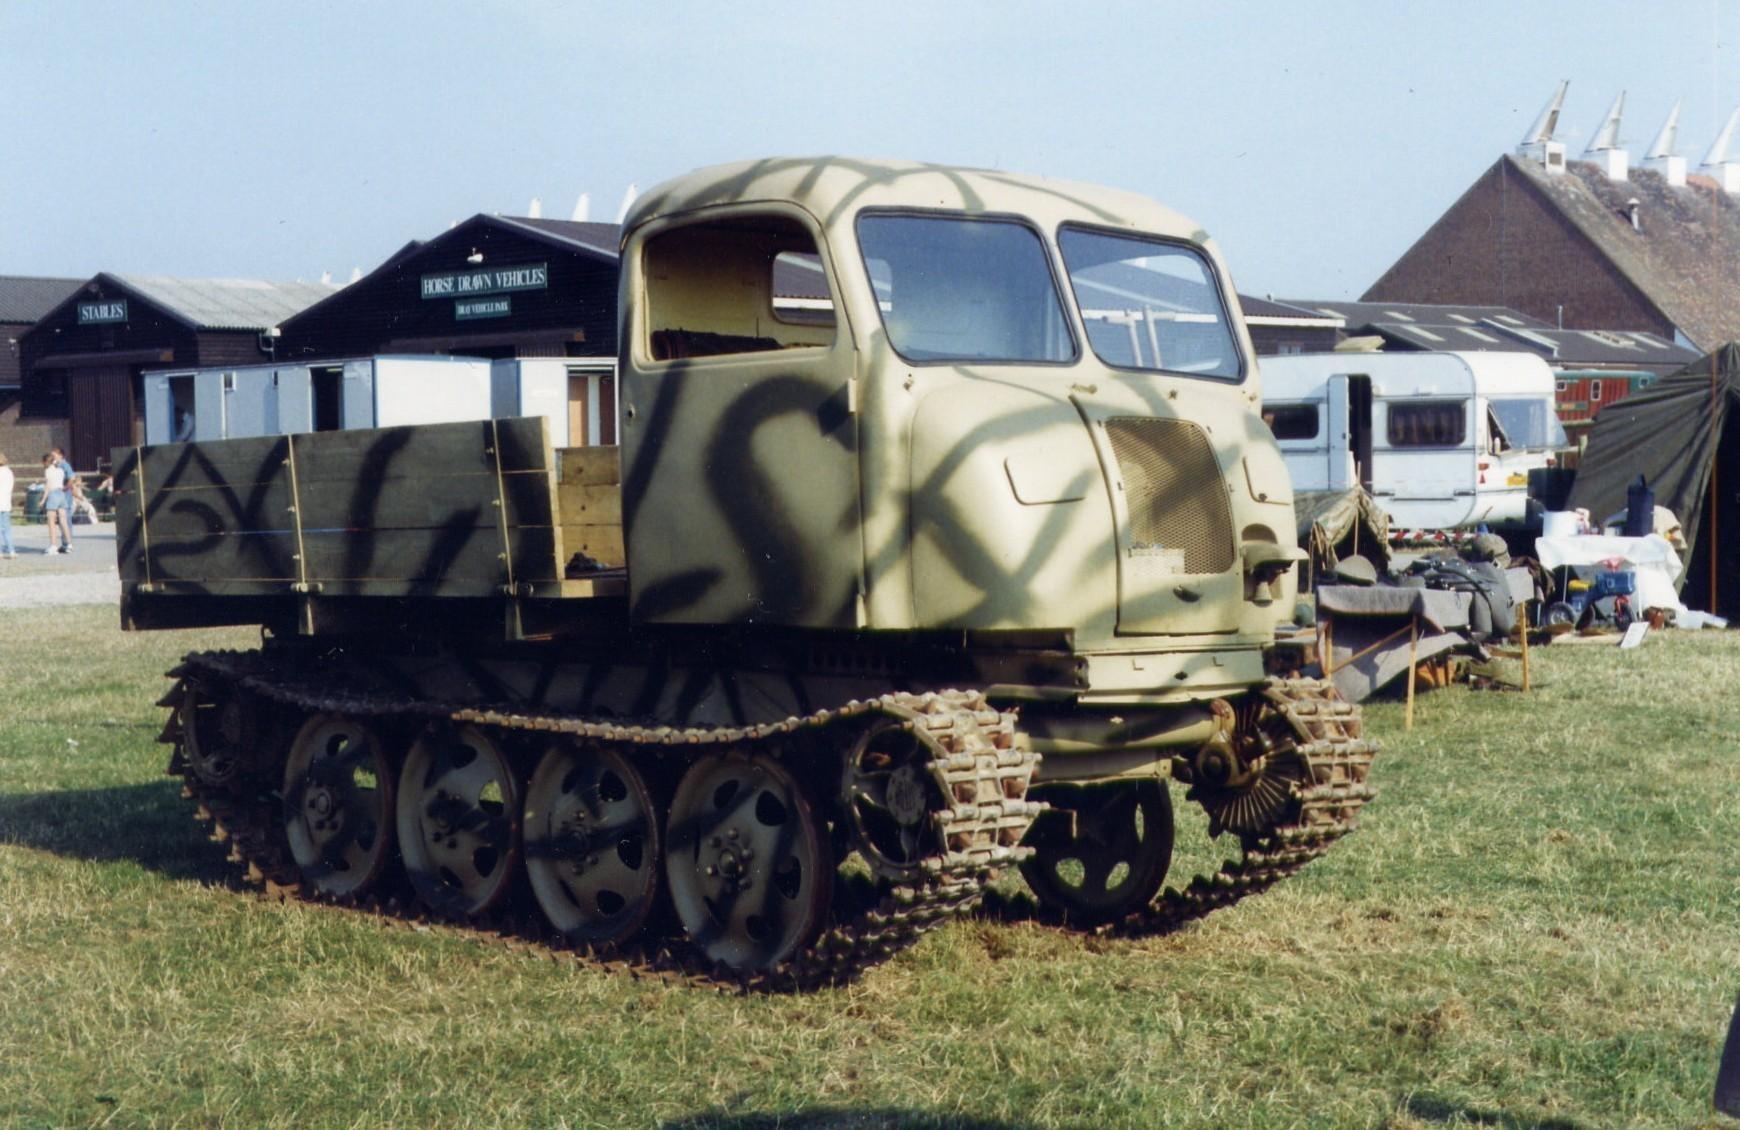 steyr-rso-01-tractor-raupen-schlepper-osttracked-tractor-east.jpg Télécharger fichier STL gratuit German WWII Tanks Trucks  • Design à imprimer en 3D, ekynops